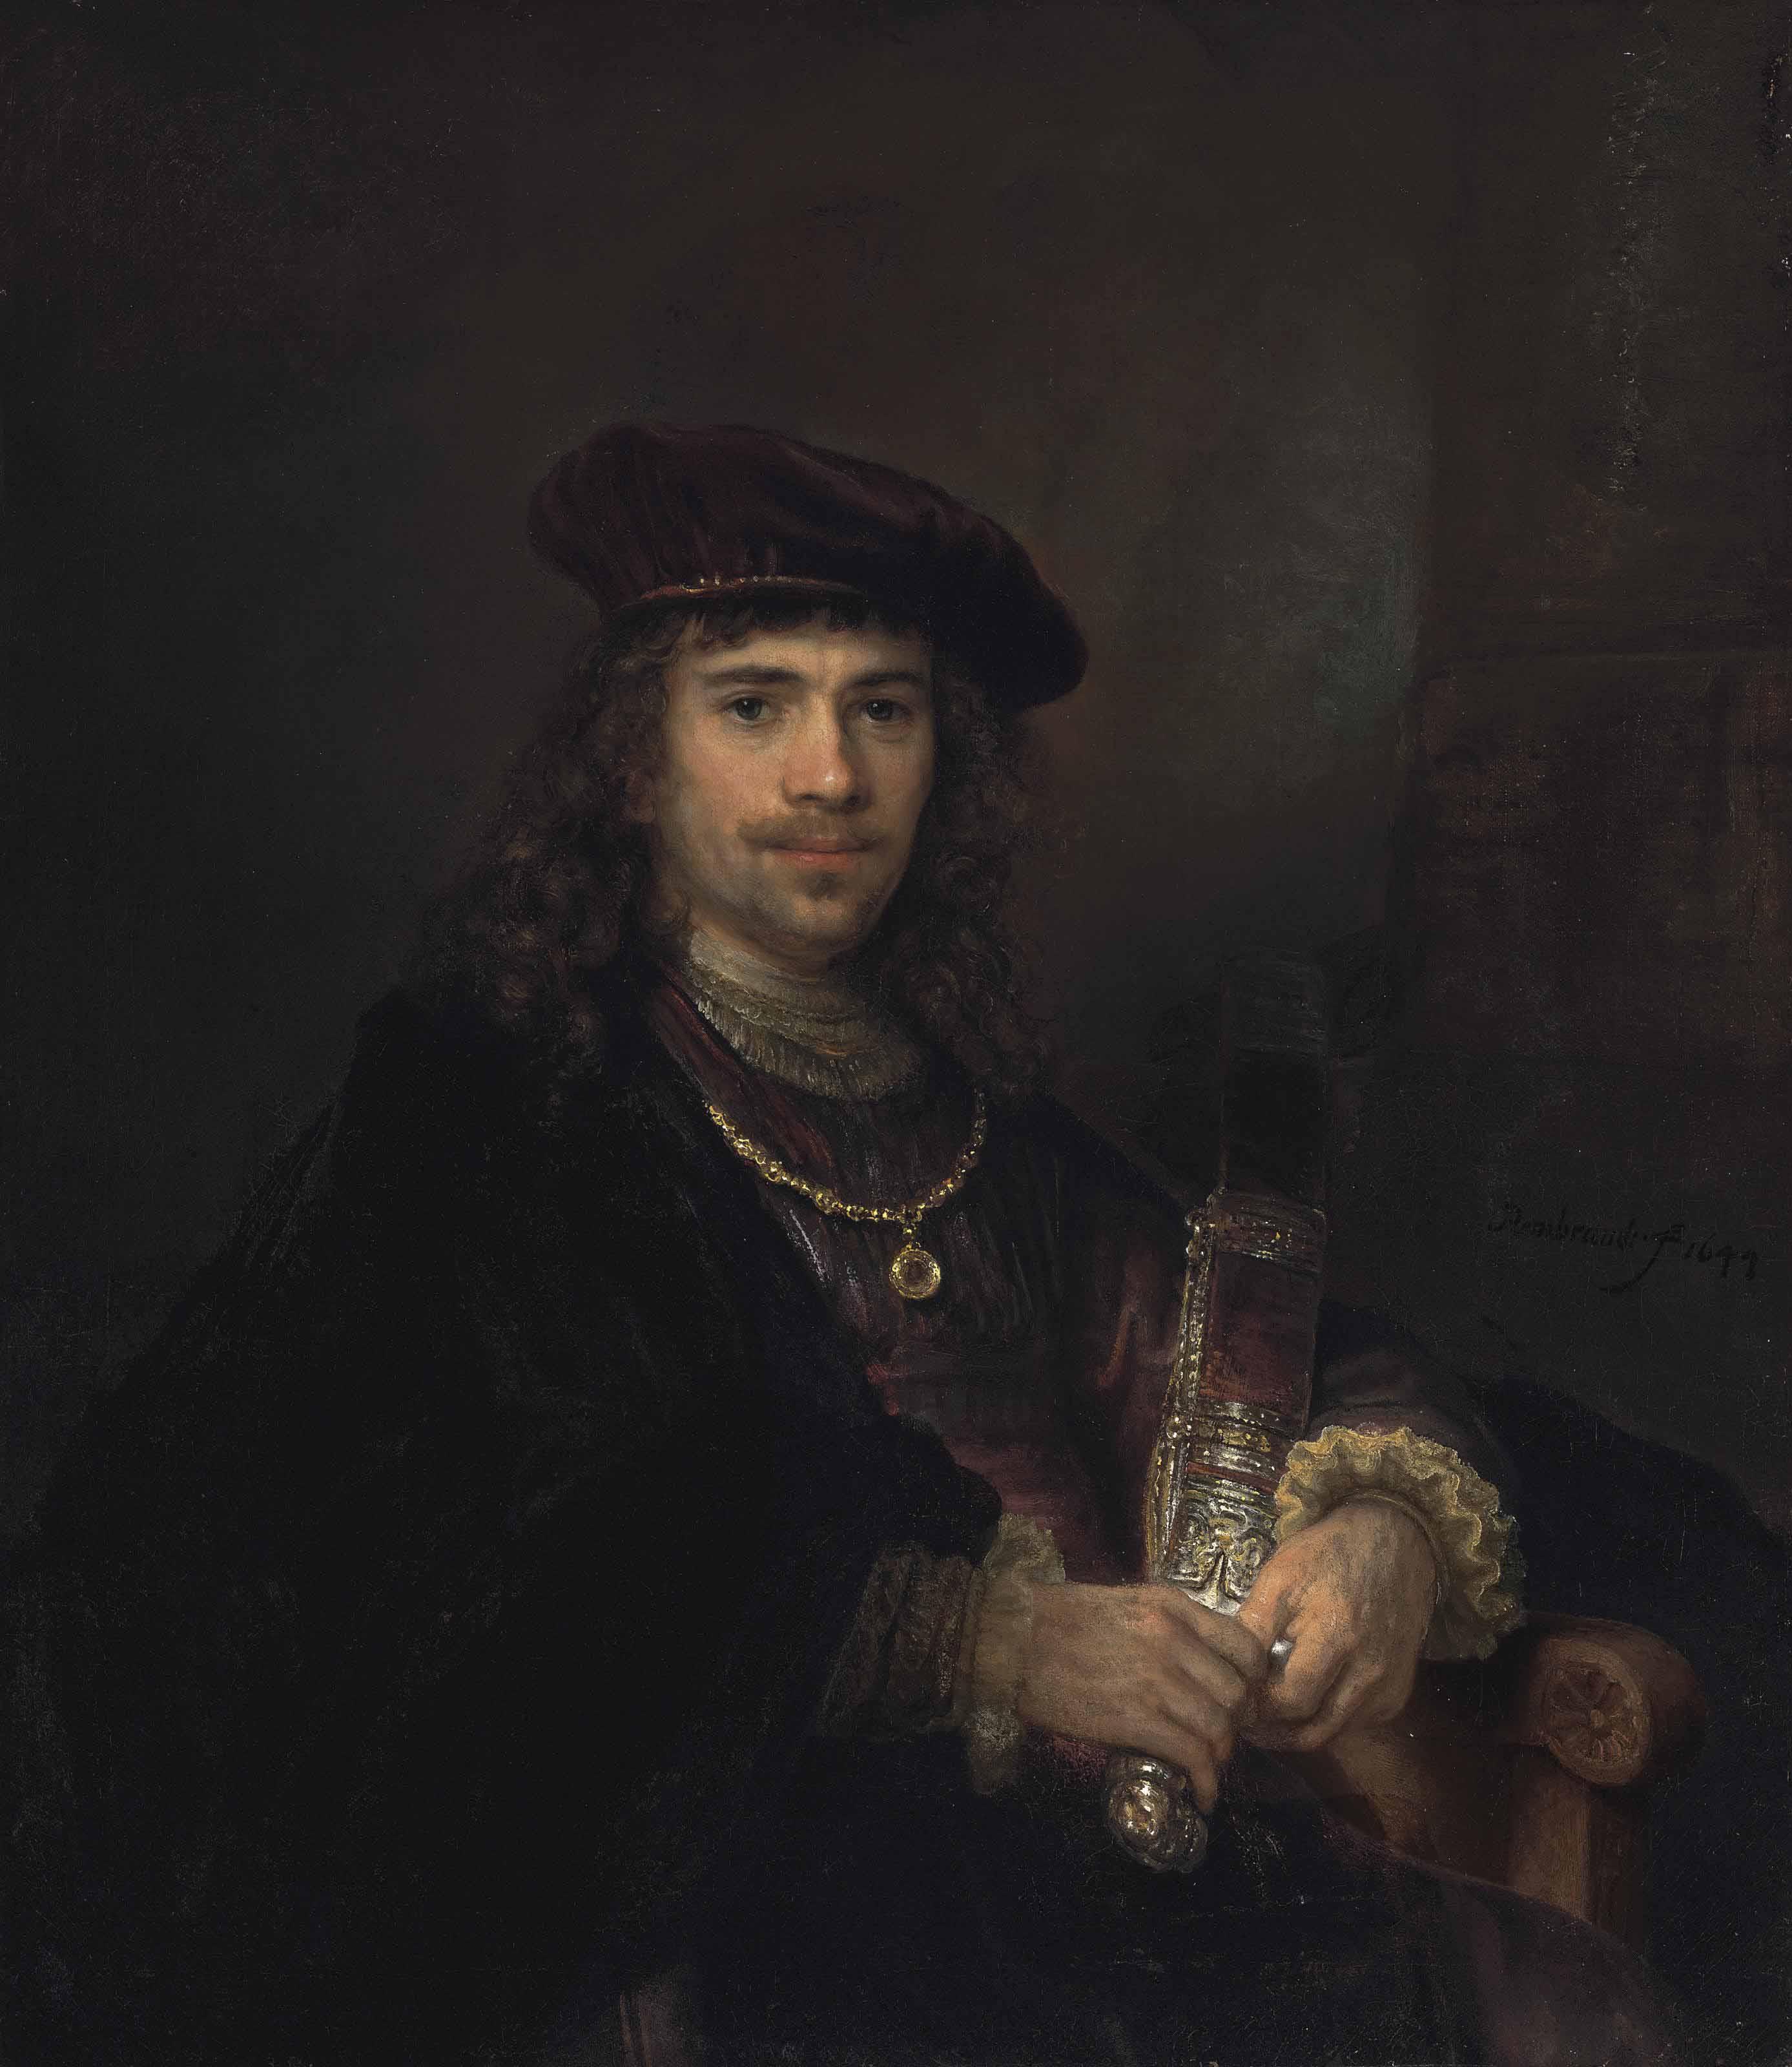 Audio: Rembrandt Harmensz. van Rijn (Leiden 1606-1669 Amsterdam) and Studio, Man with a Sword